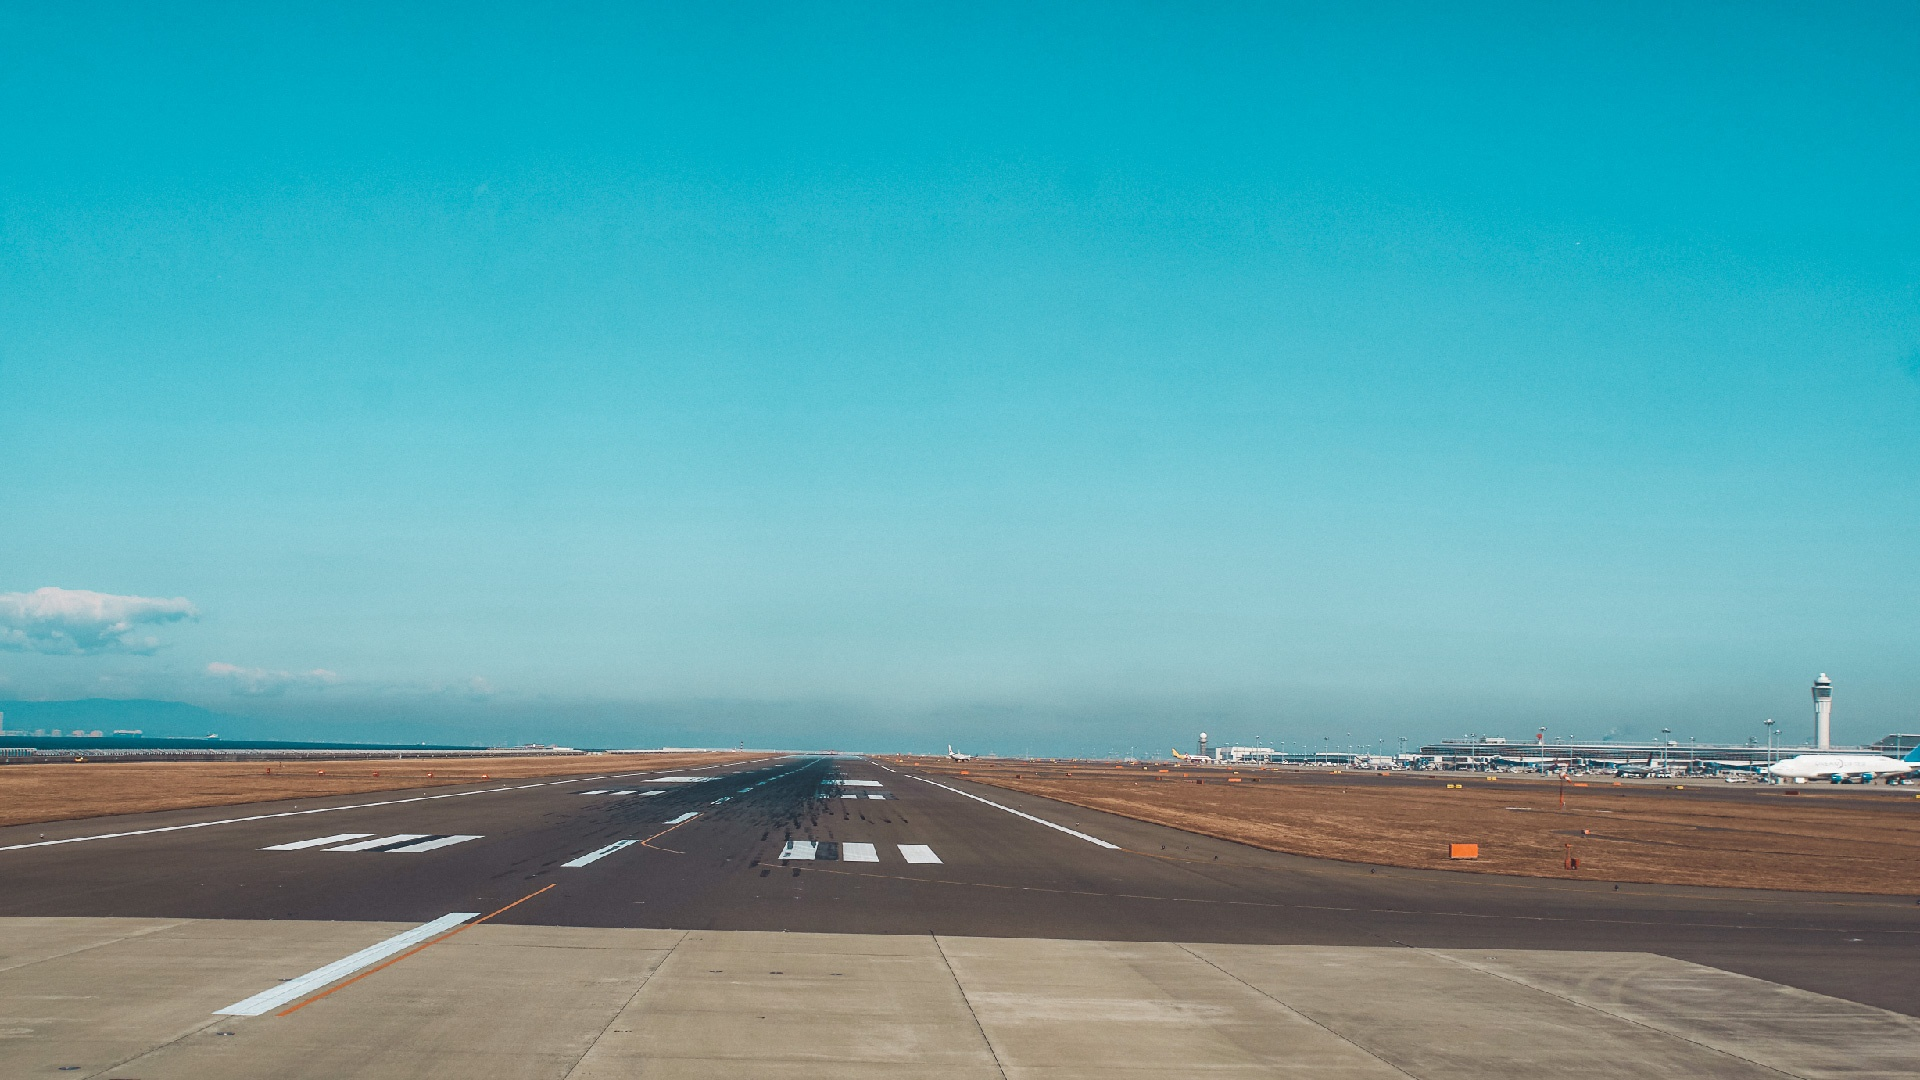 AB Jets runway